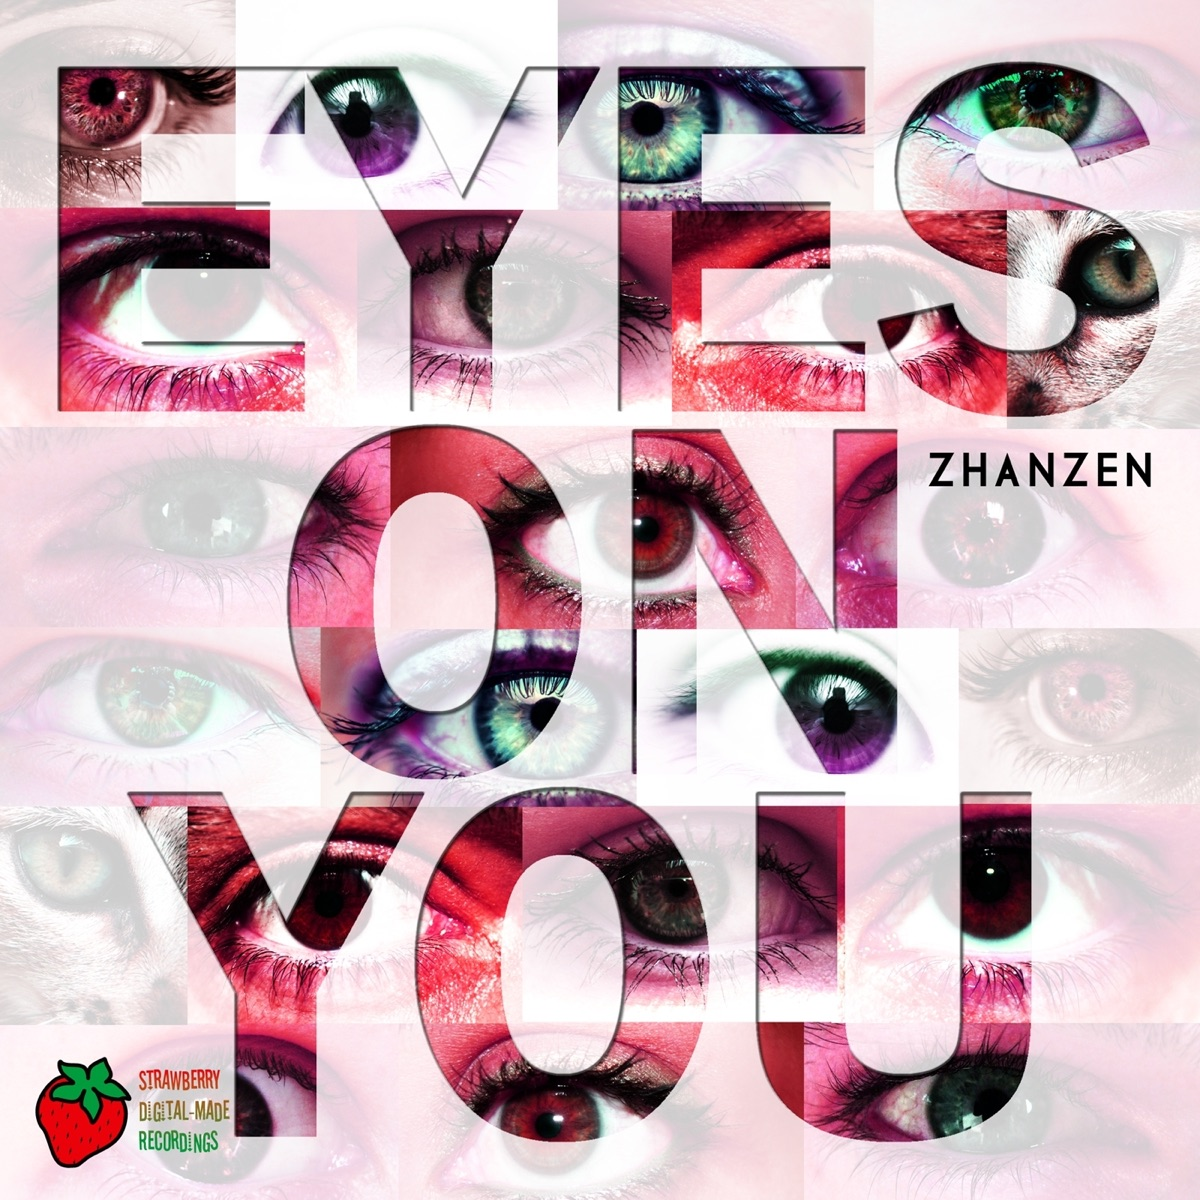 Eyes On You - EP Zhanzen CD cover